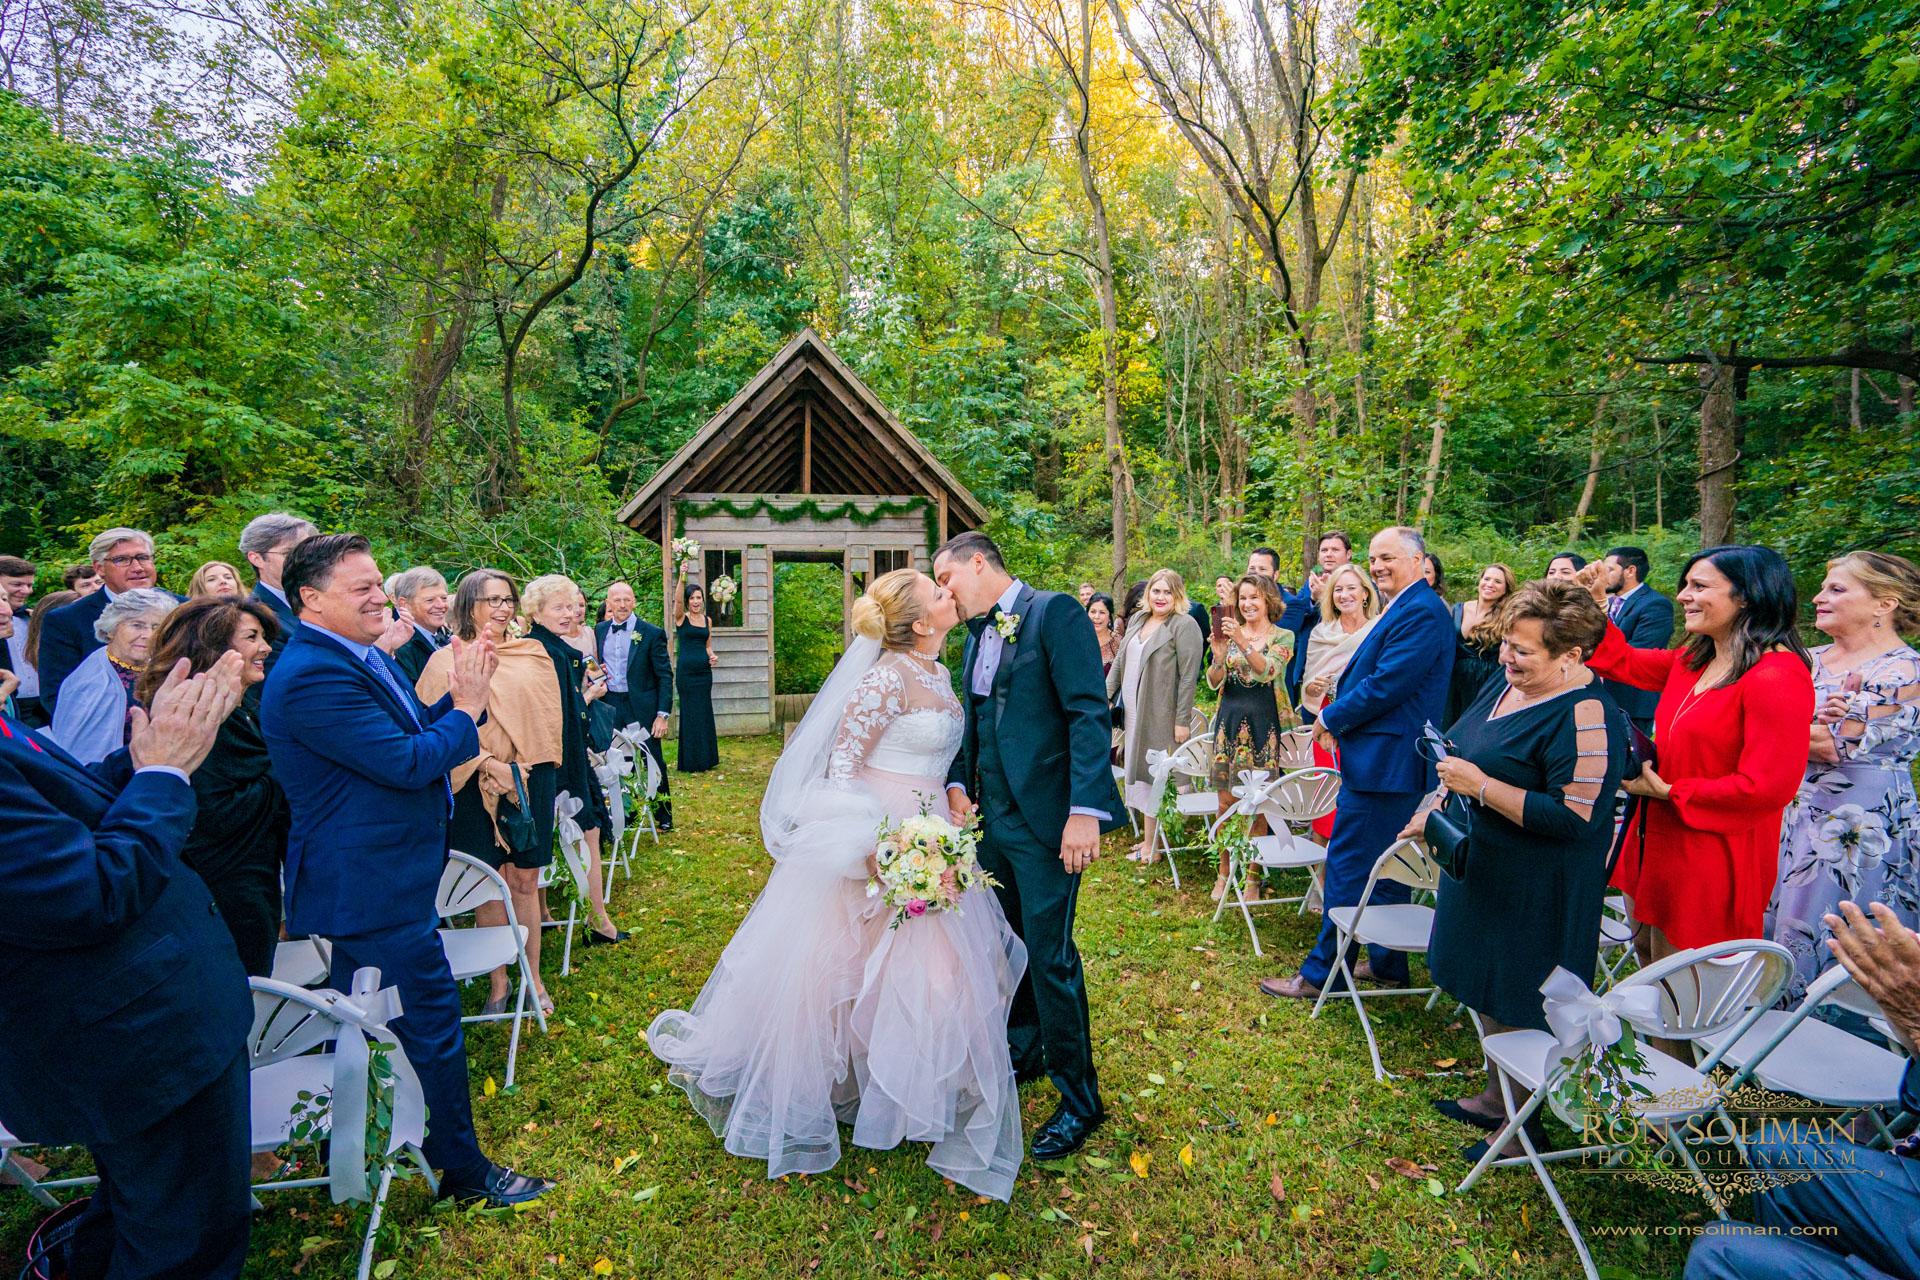 ALVERTHORPE MANOR HOUSE WEDDING 25